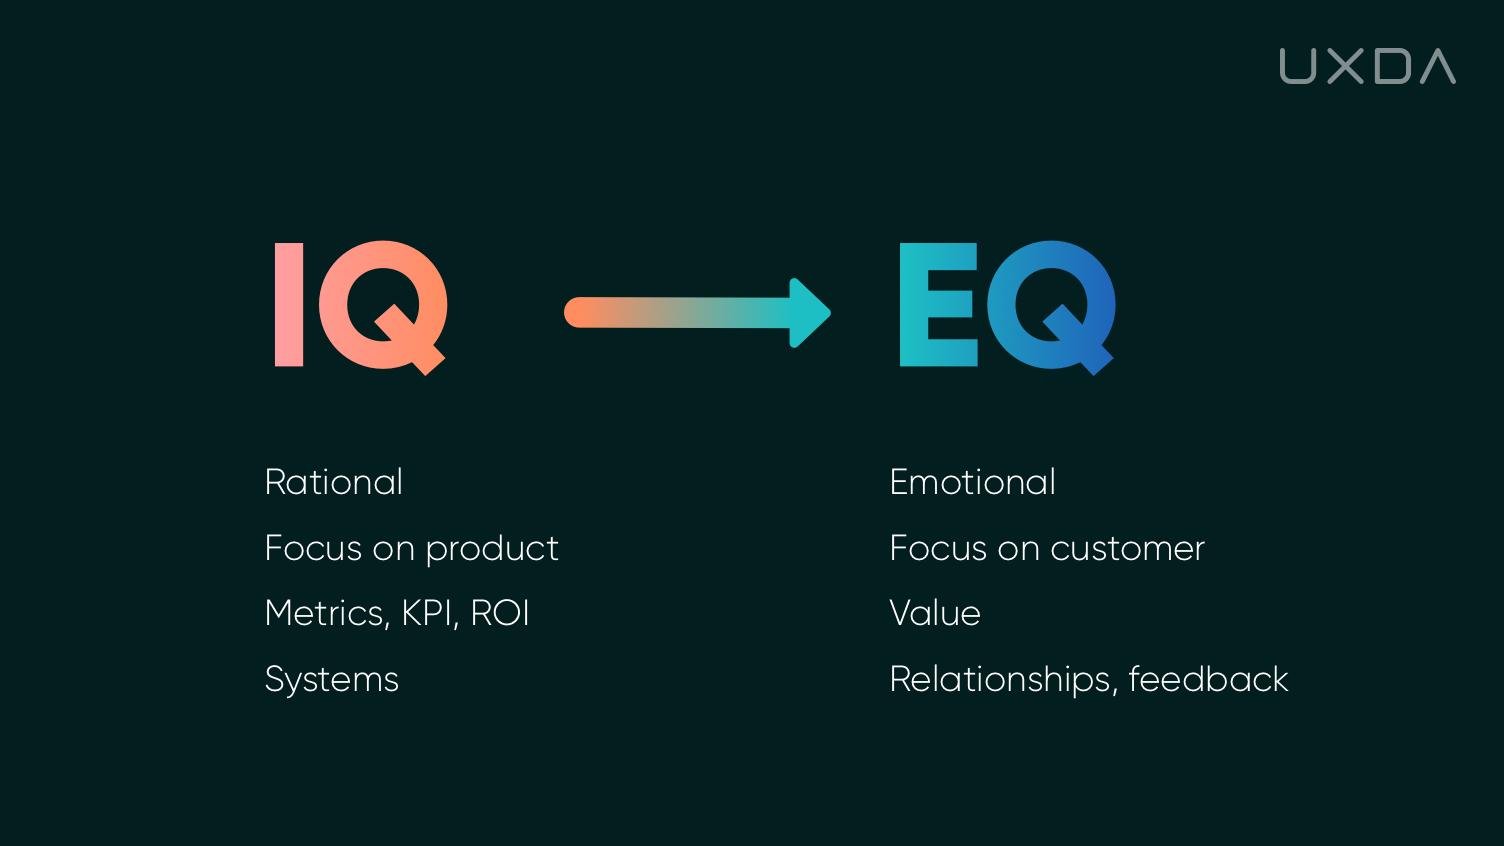 digital-banking-customer-experience-trends-7.jpg